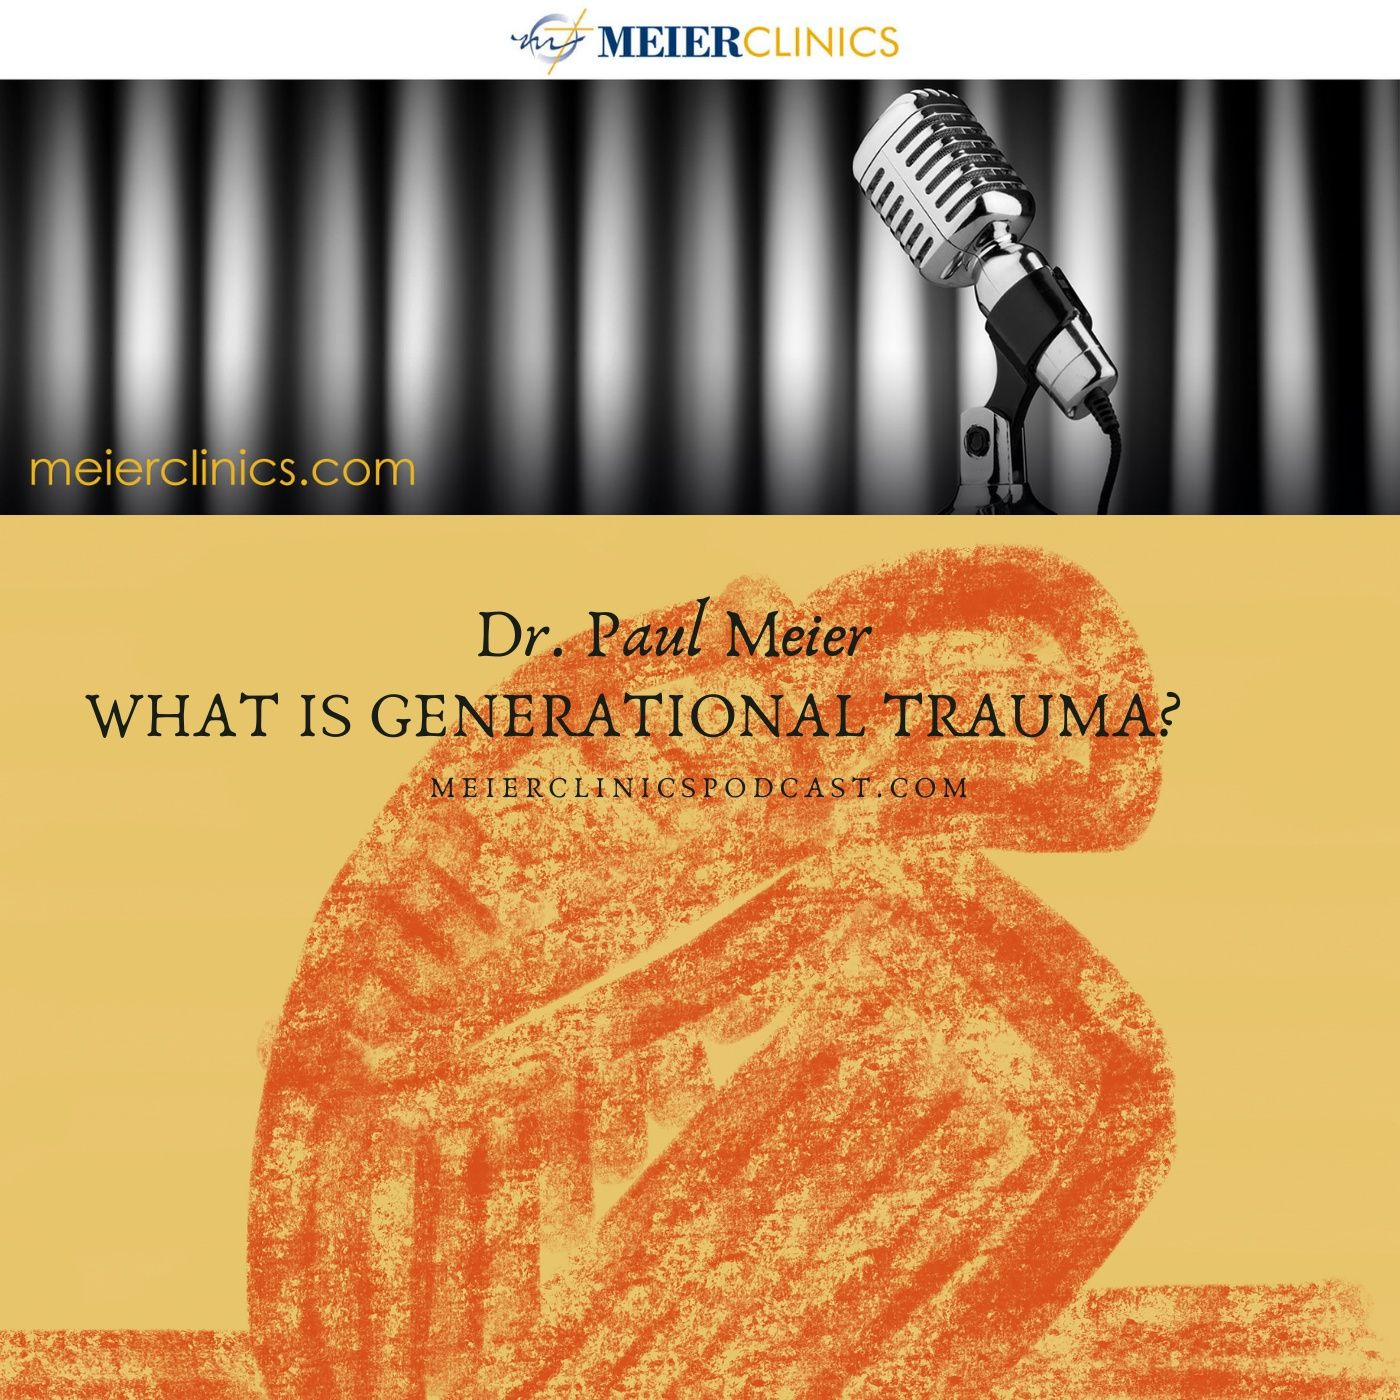 What Is Generational Trauma?